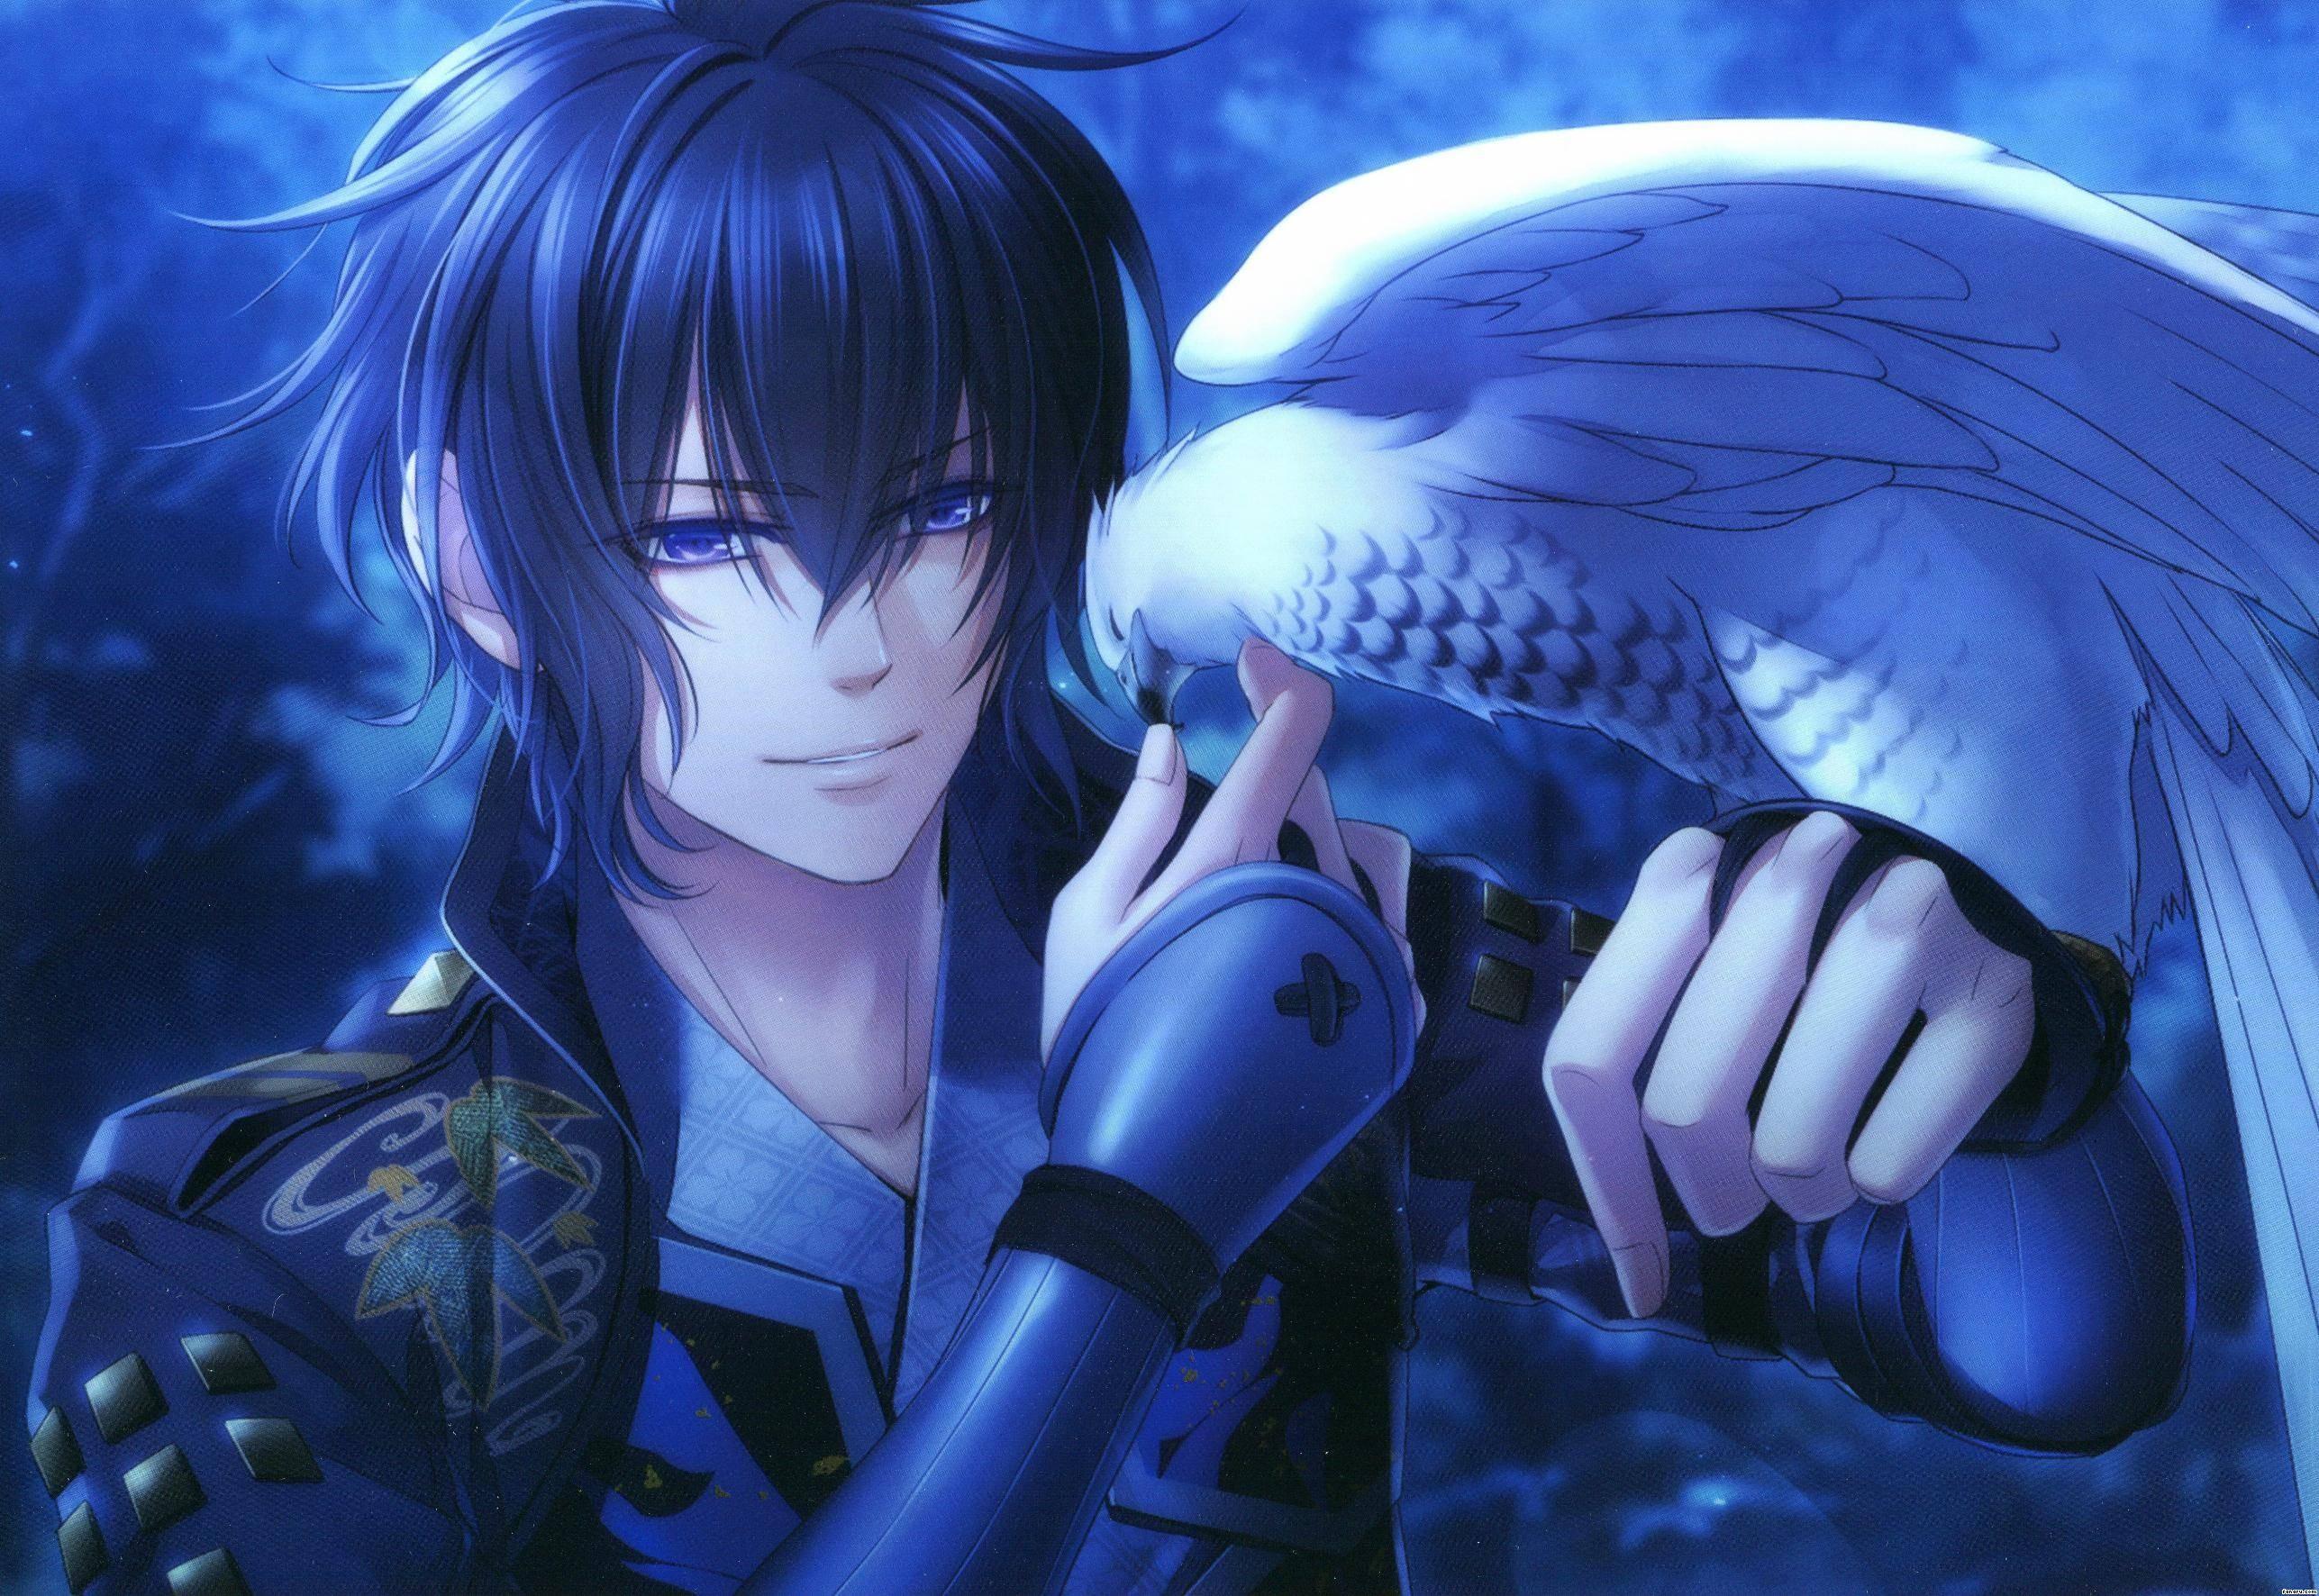 Birds anime blue eyes anime boys blue hawks eagle toki no kizuna kazuya toki no kizuna